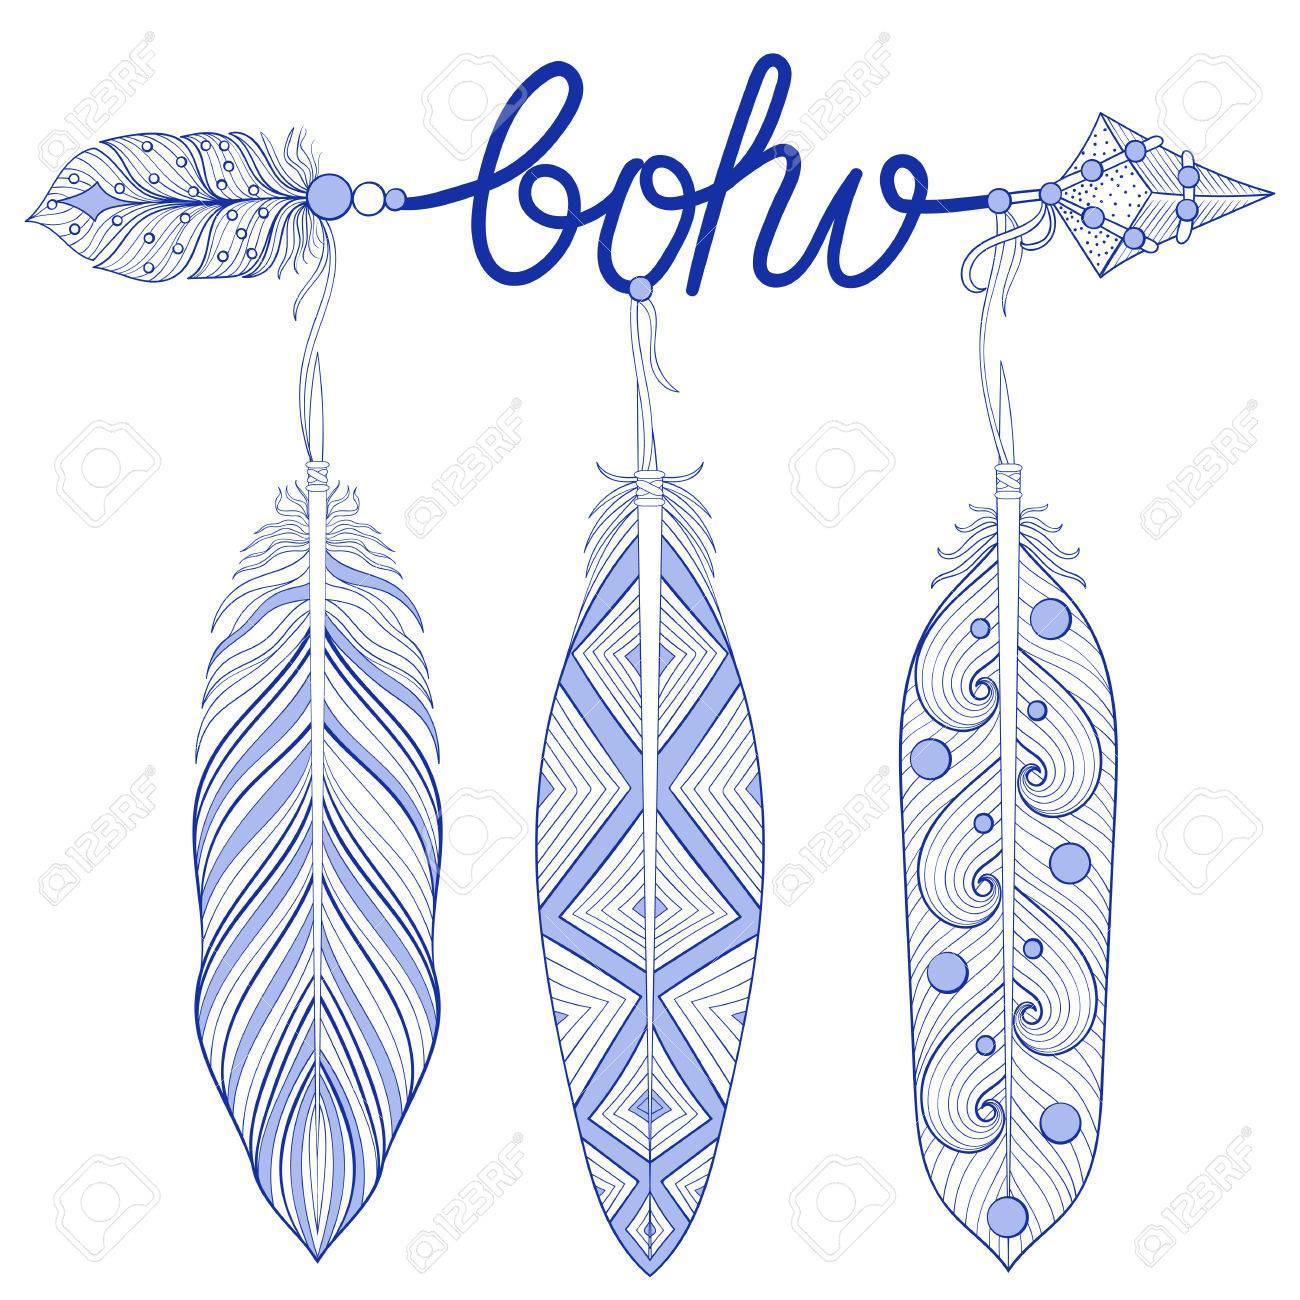 Blau Bohemian Pfeil, Amulett, Boho Buchstaben Mit Henna Federn ...